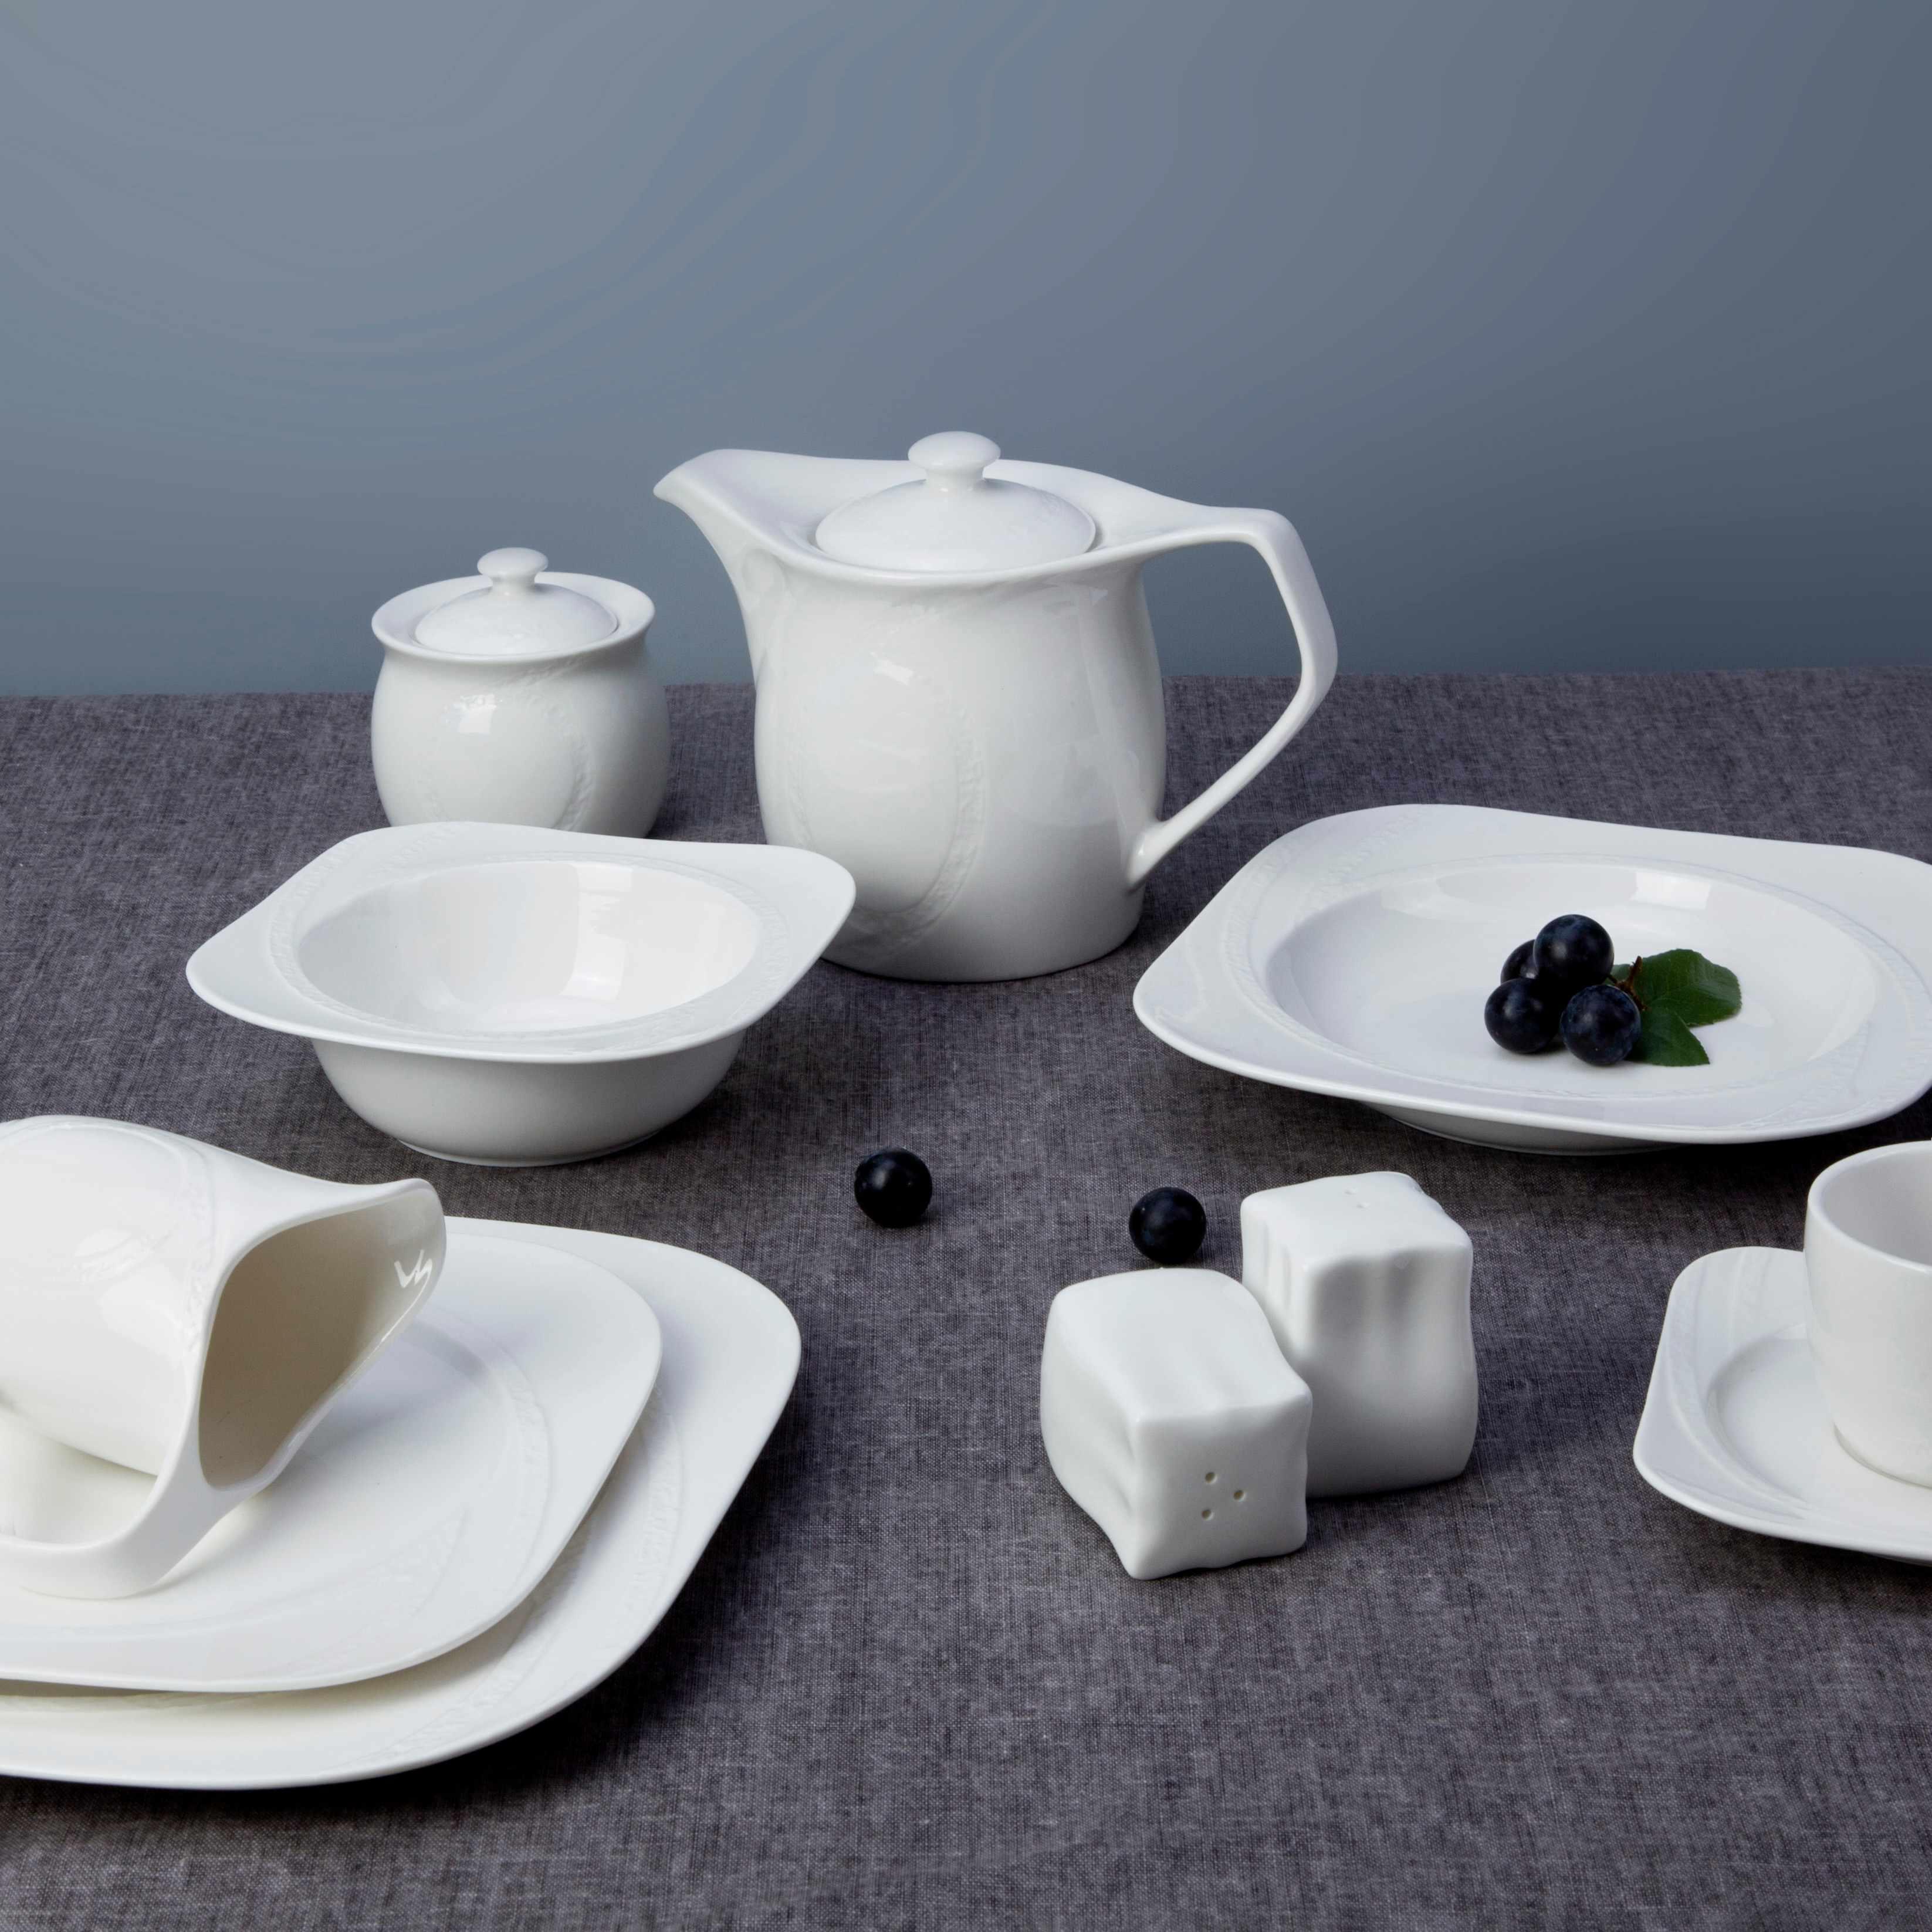 Two Eight White ceramic dinnerware set - JIN SUO TU WEN SERIES White Porcelain Dinner Set image12